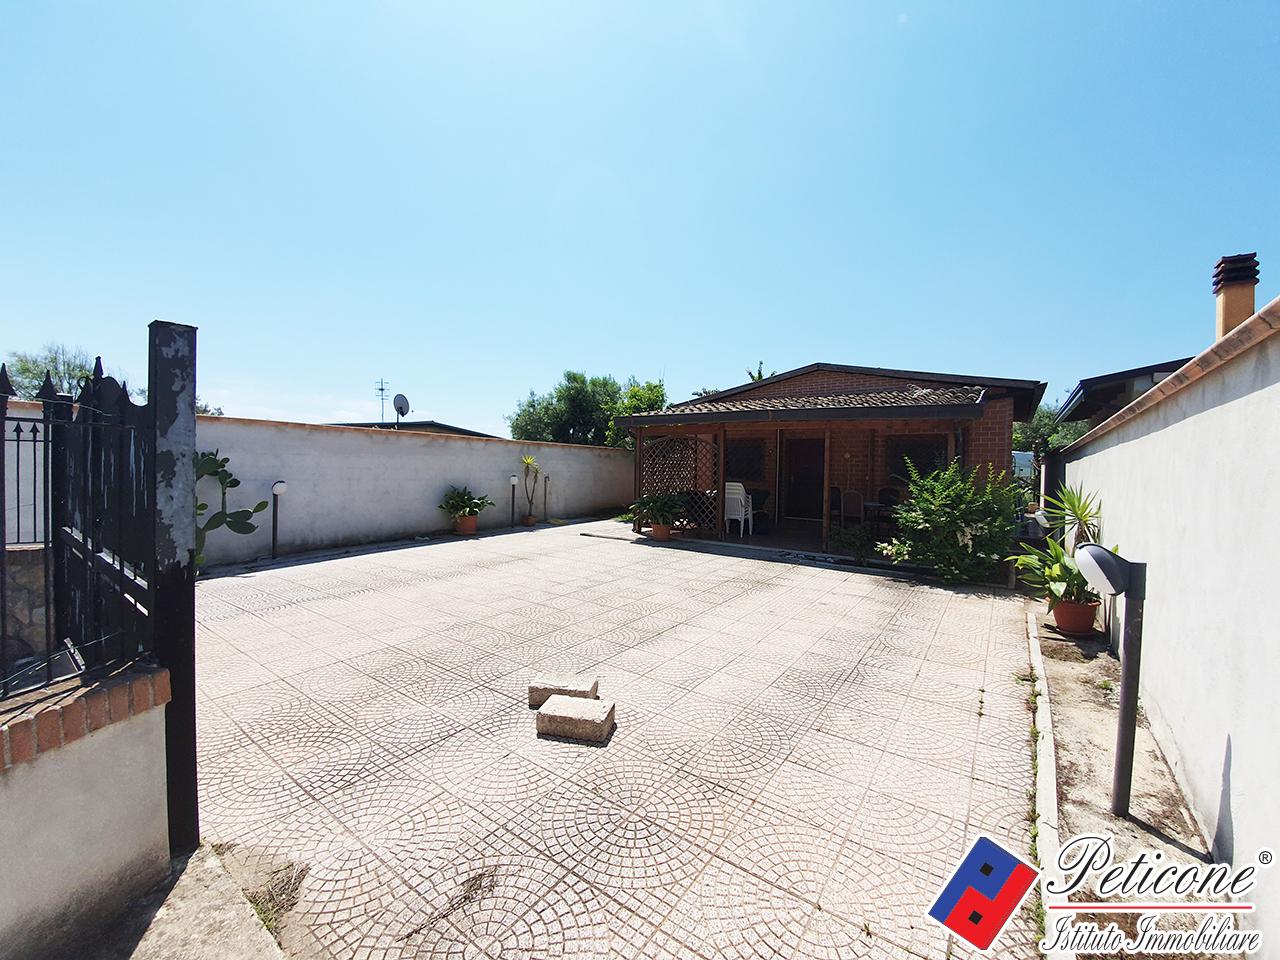 Villa in Vendita a Fondi: 4 locali, 50 mq - Foto 13